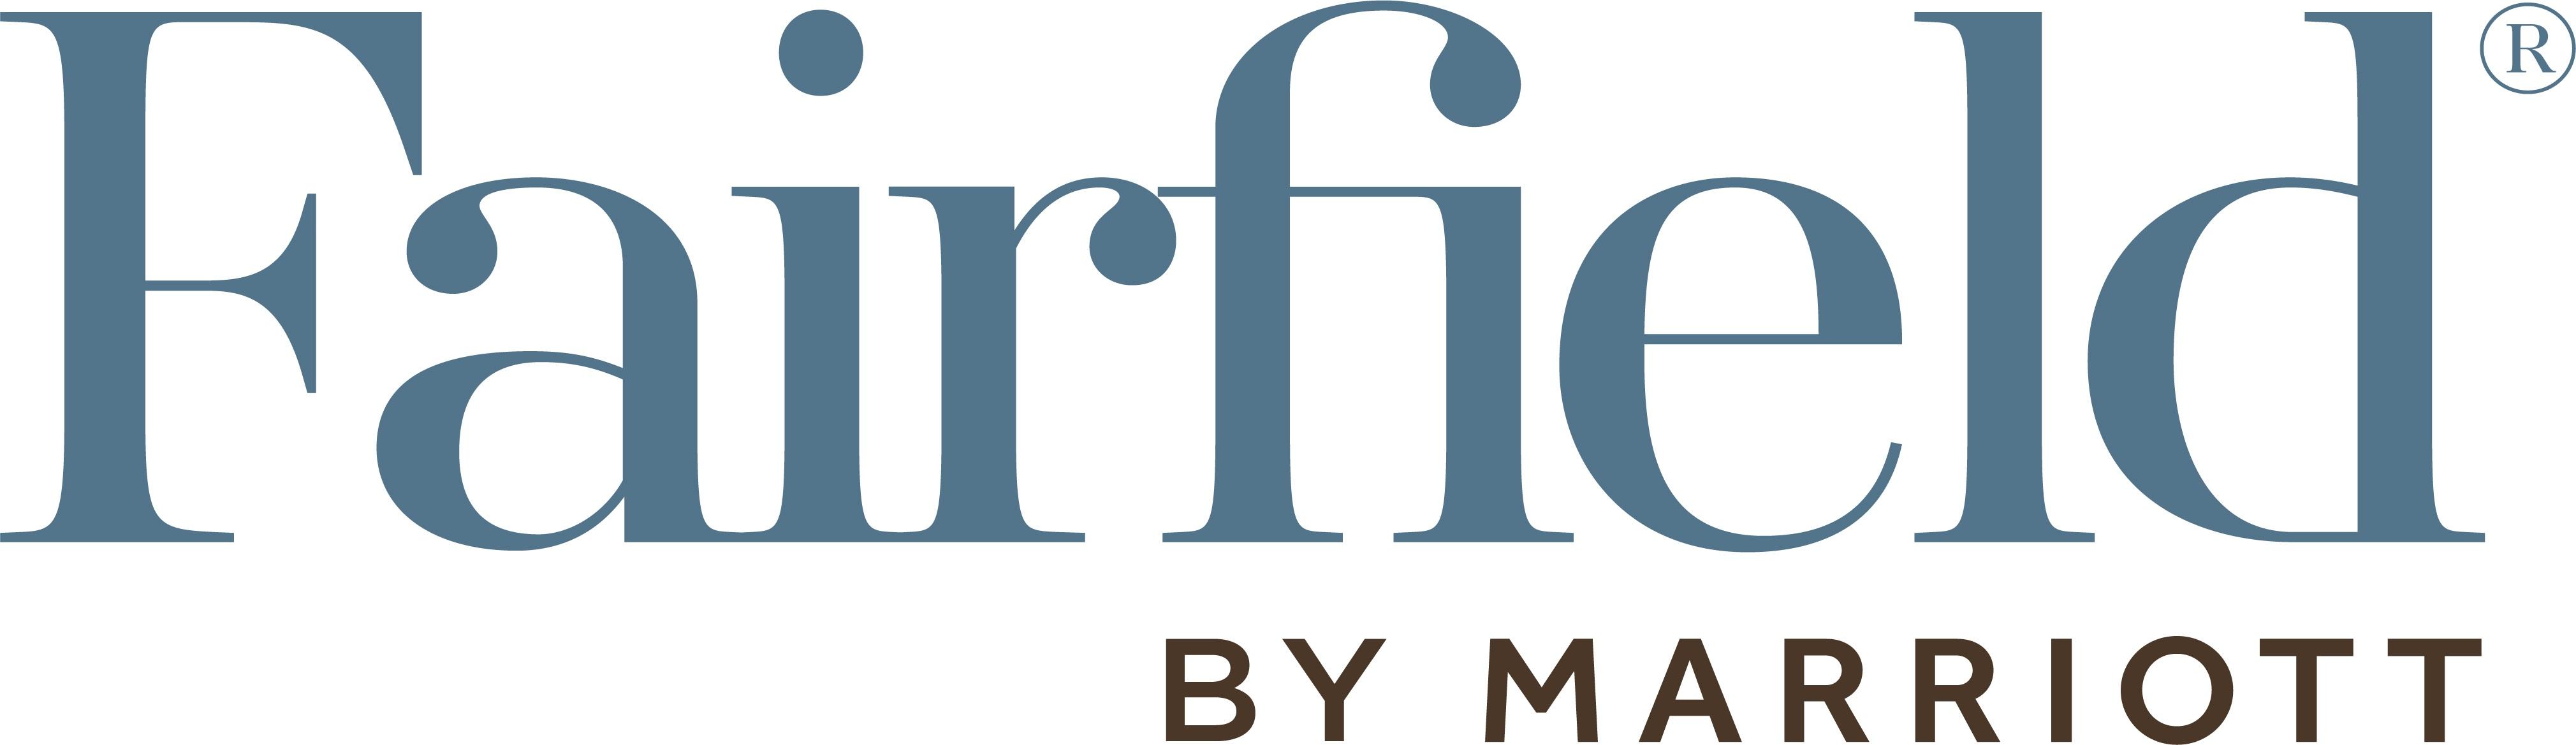 paws4people Sponsor | Fairfield Inn Marriott | Marrietta, OH